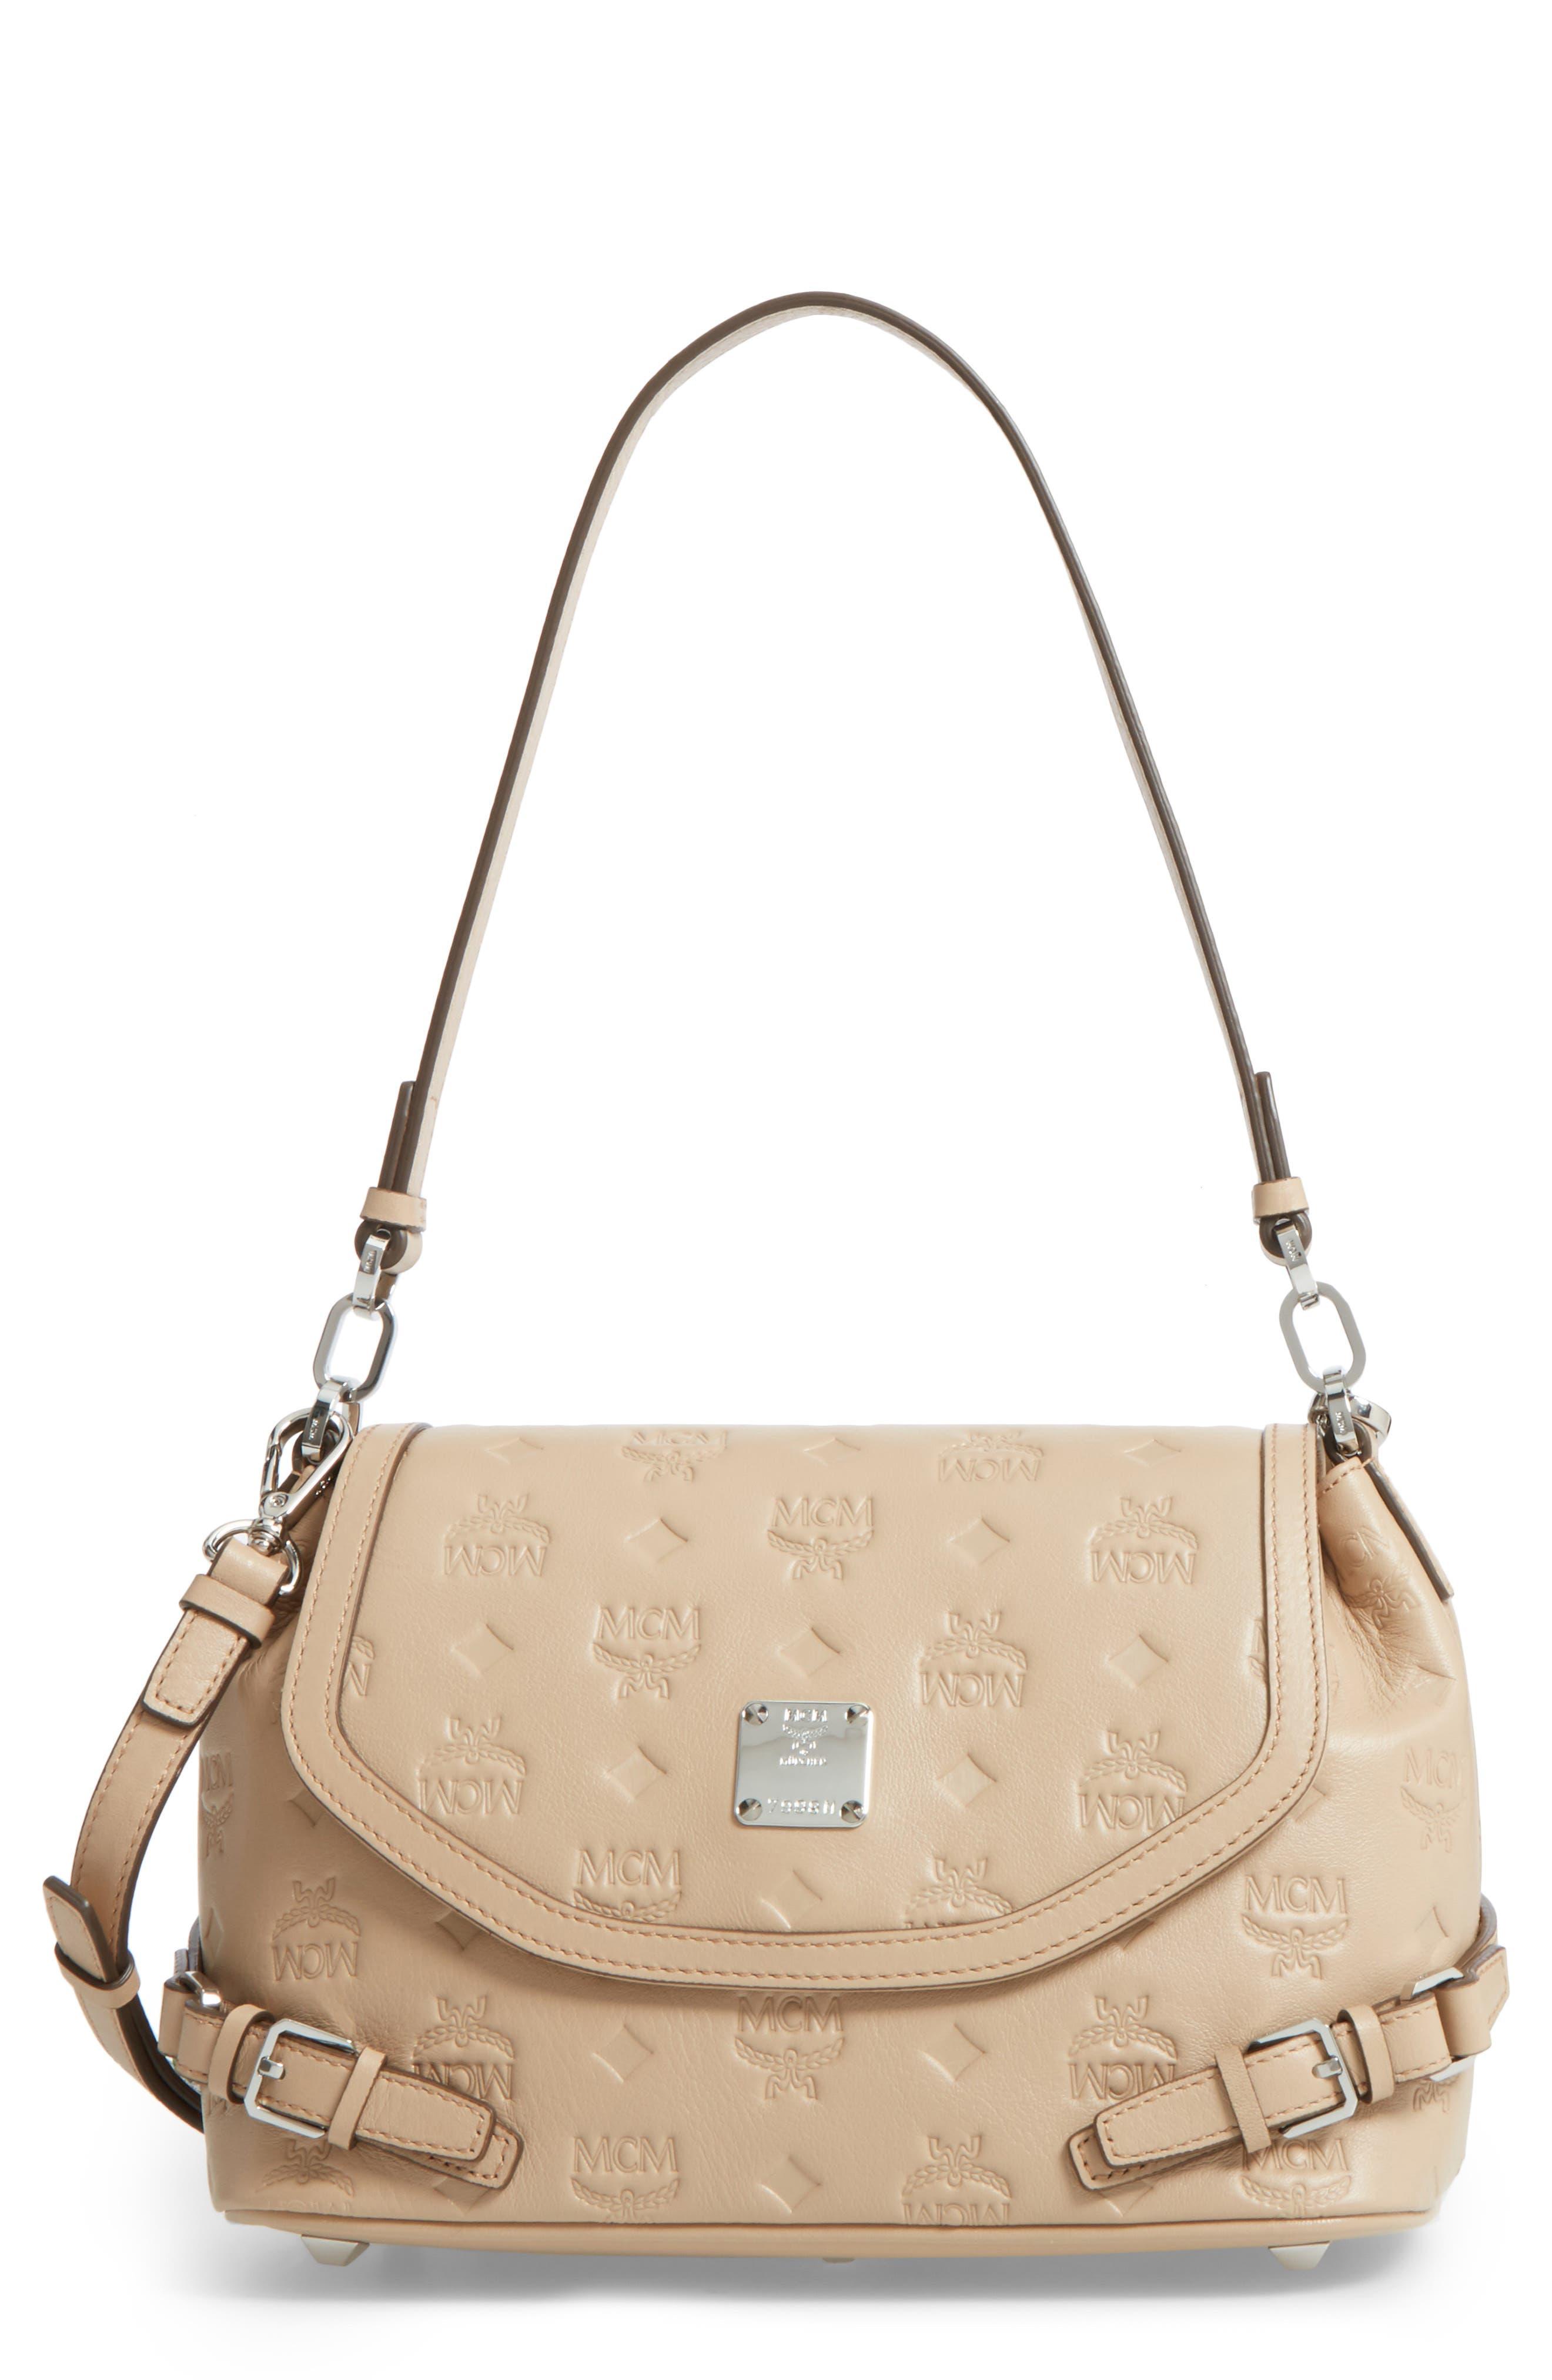 MCM Signature Monogram Embossed Leather Shoulder/Crossbody Bag